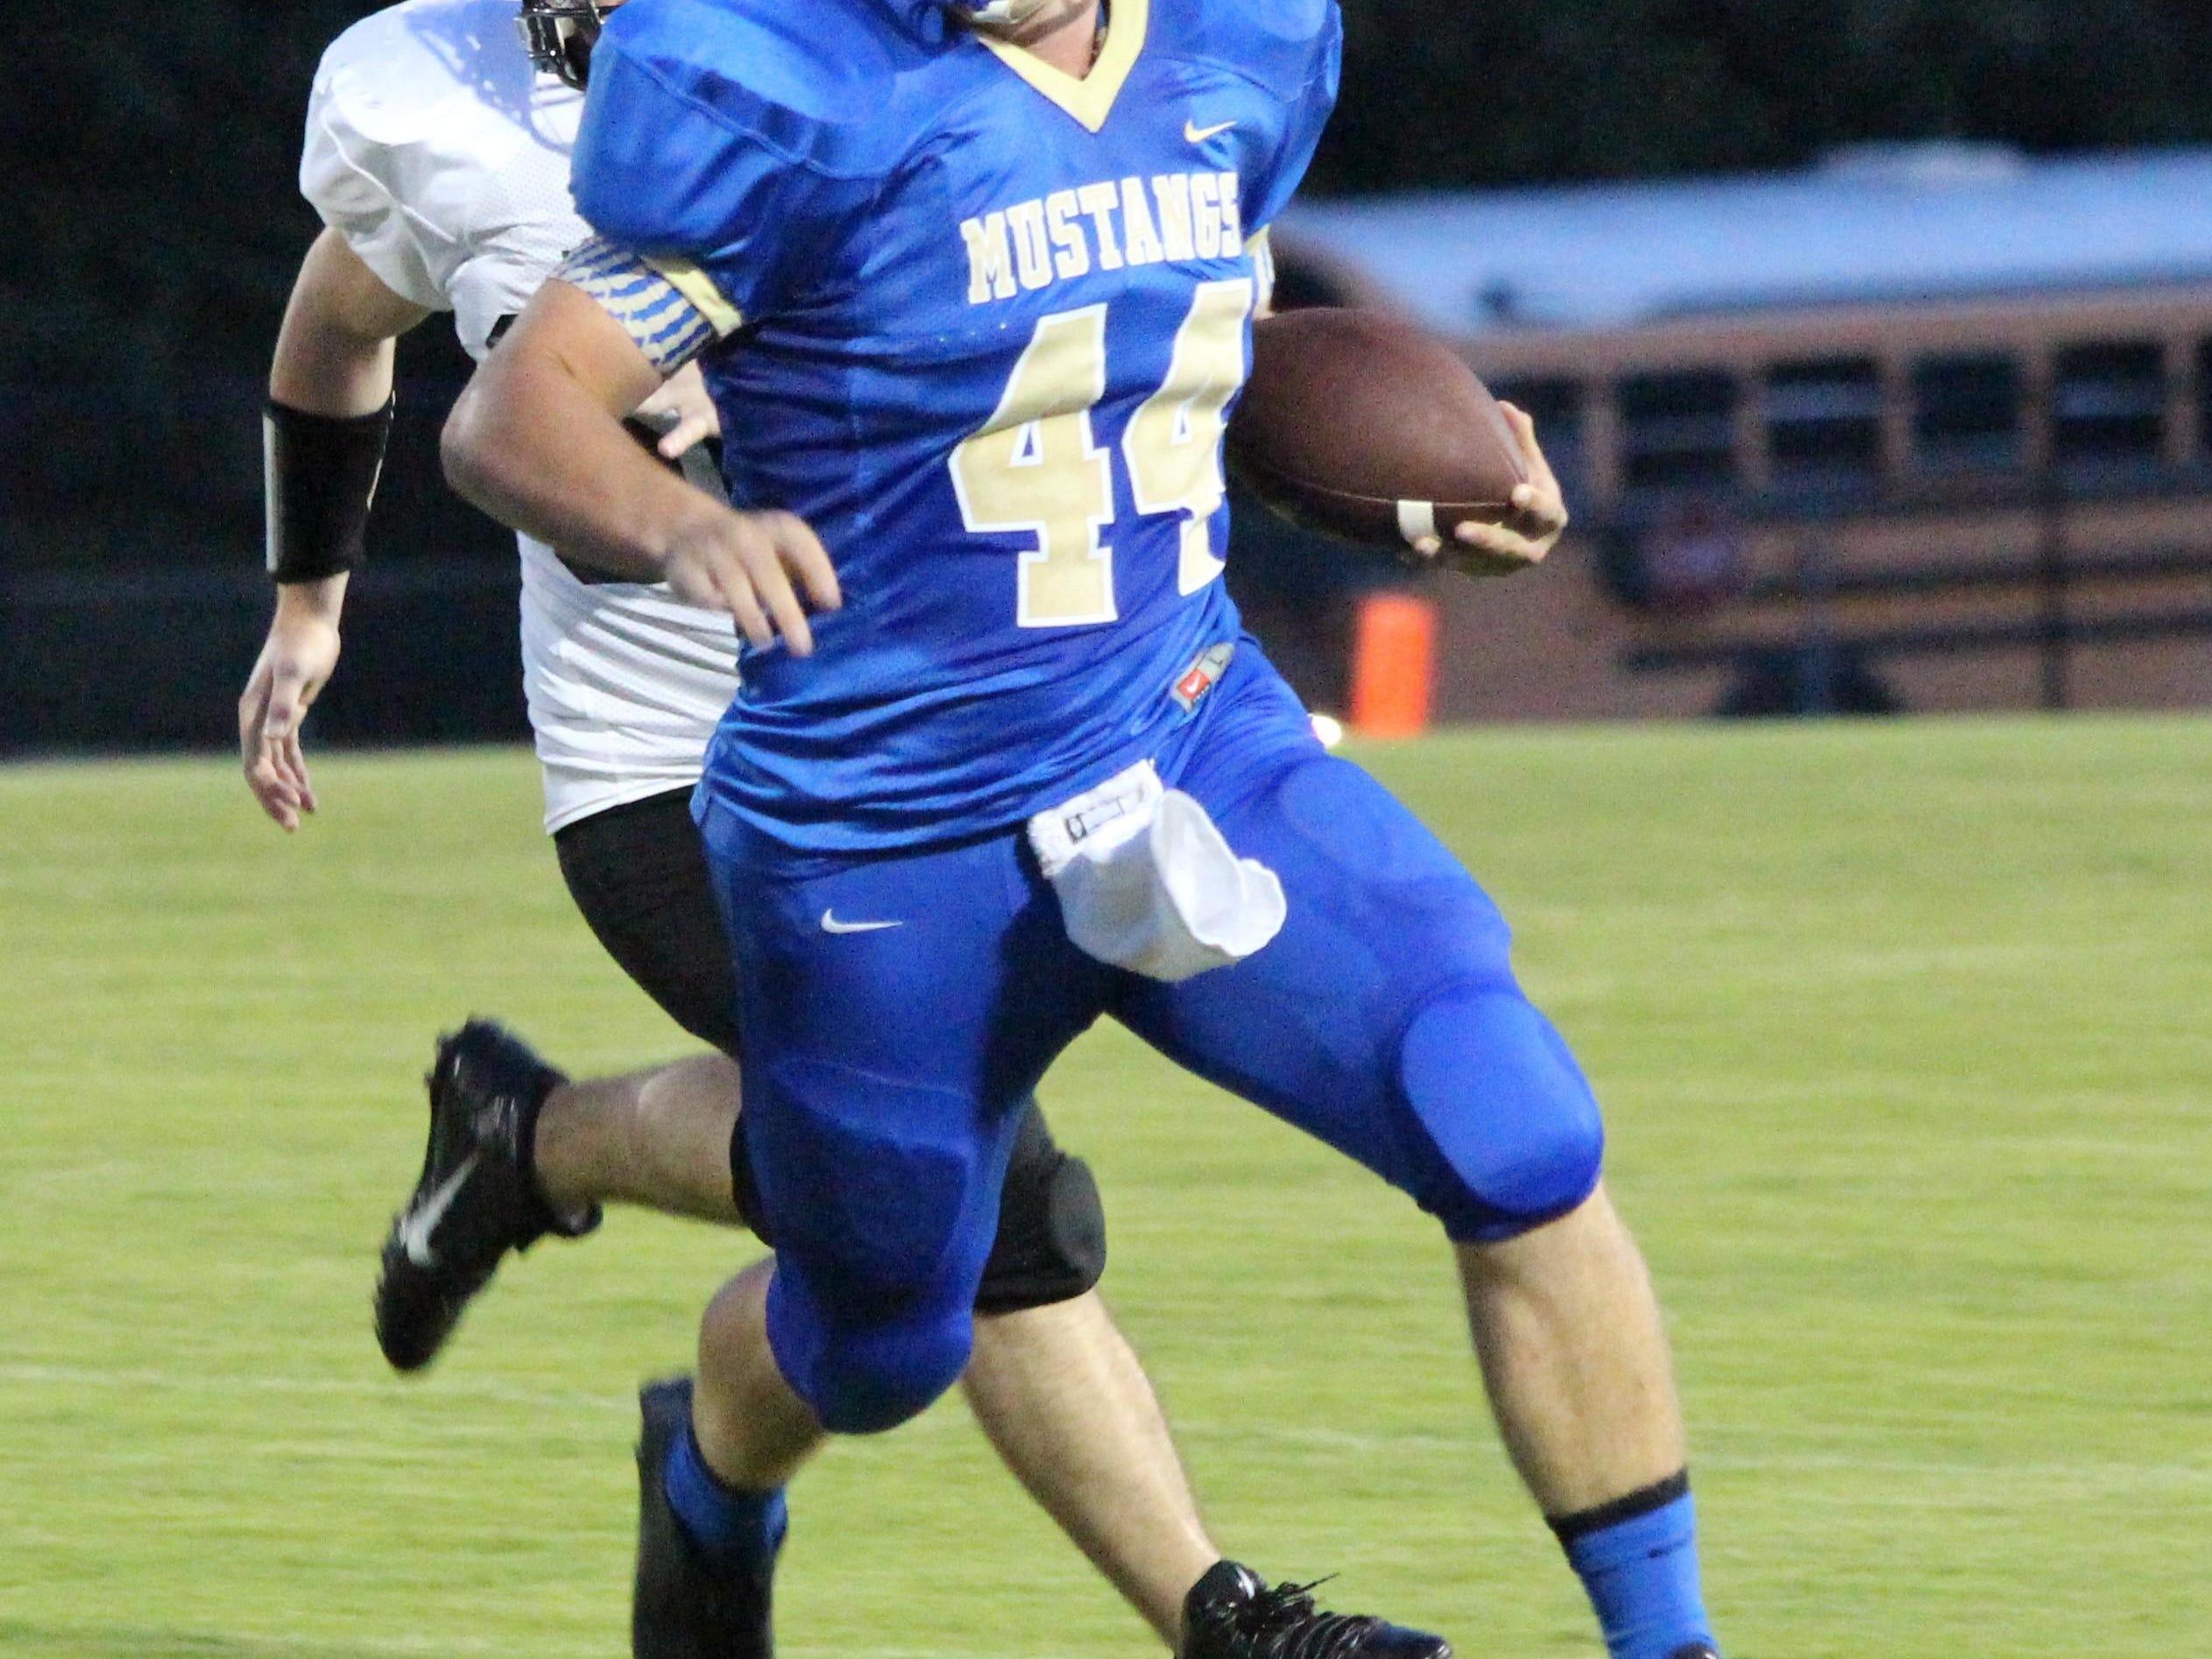 Kade Pearson plays football and baseball at Huntingdon High School.